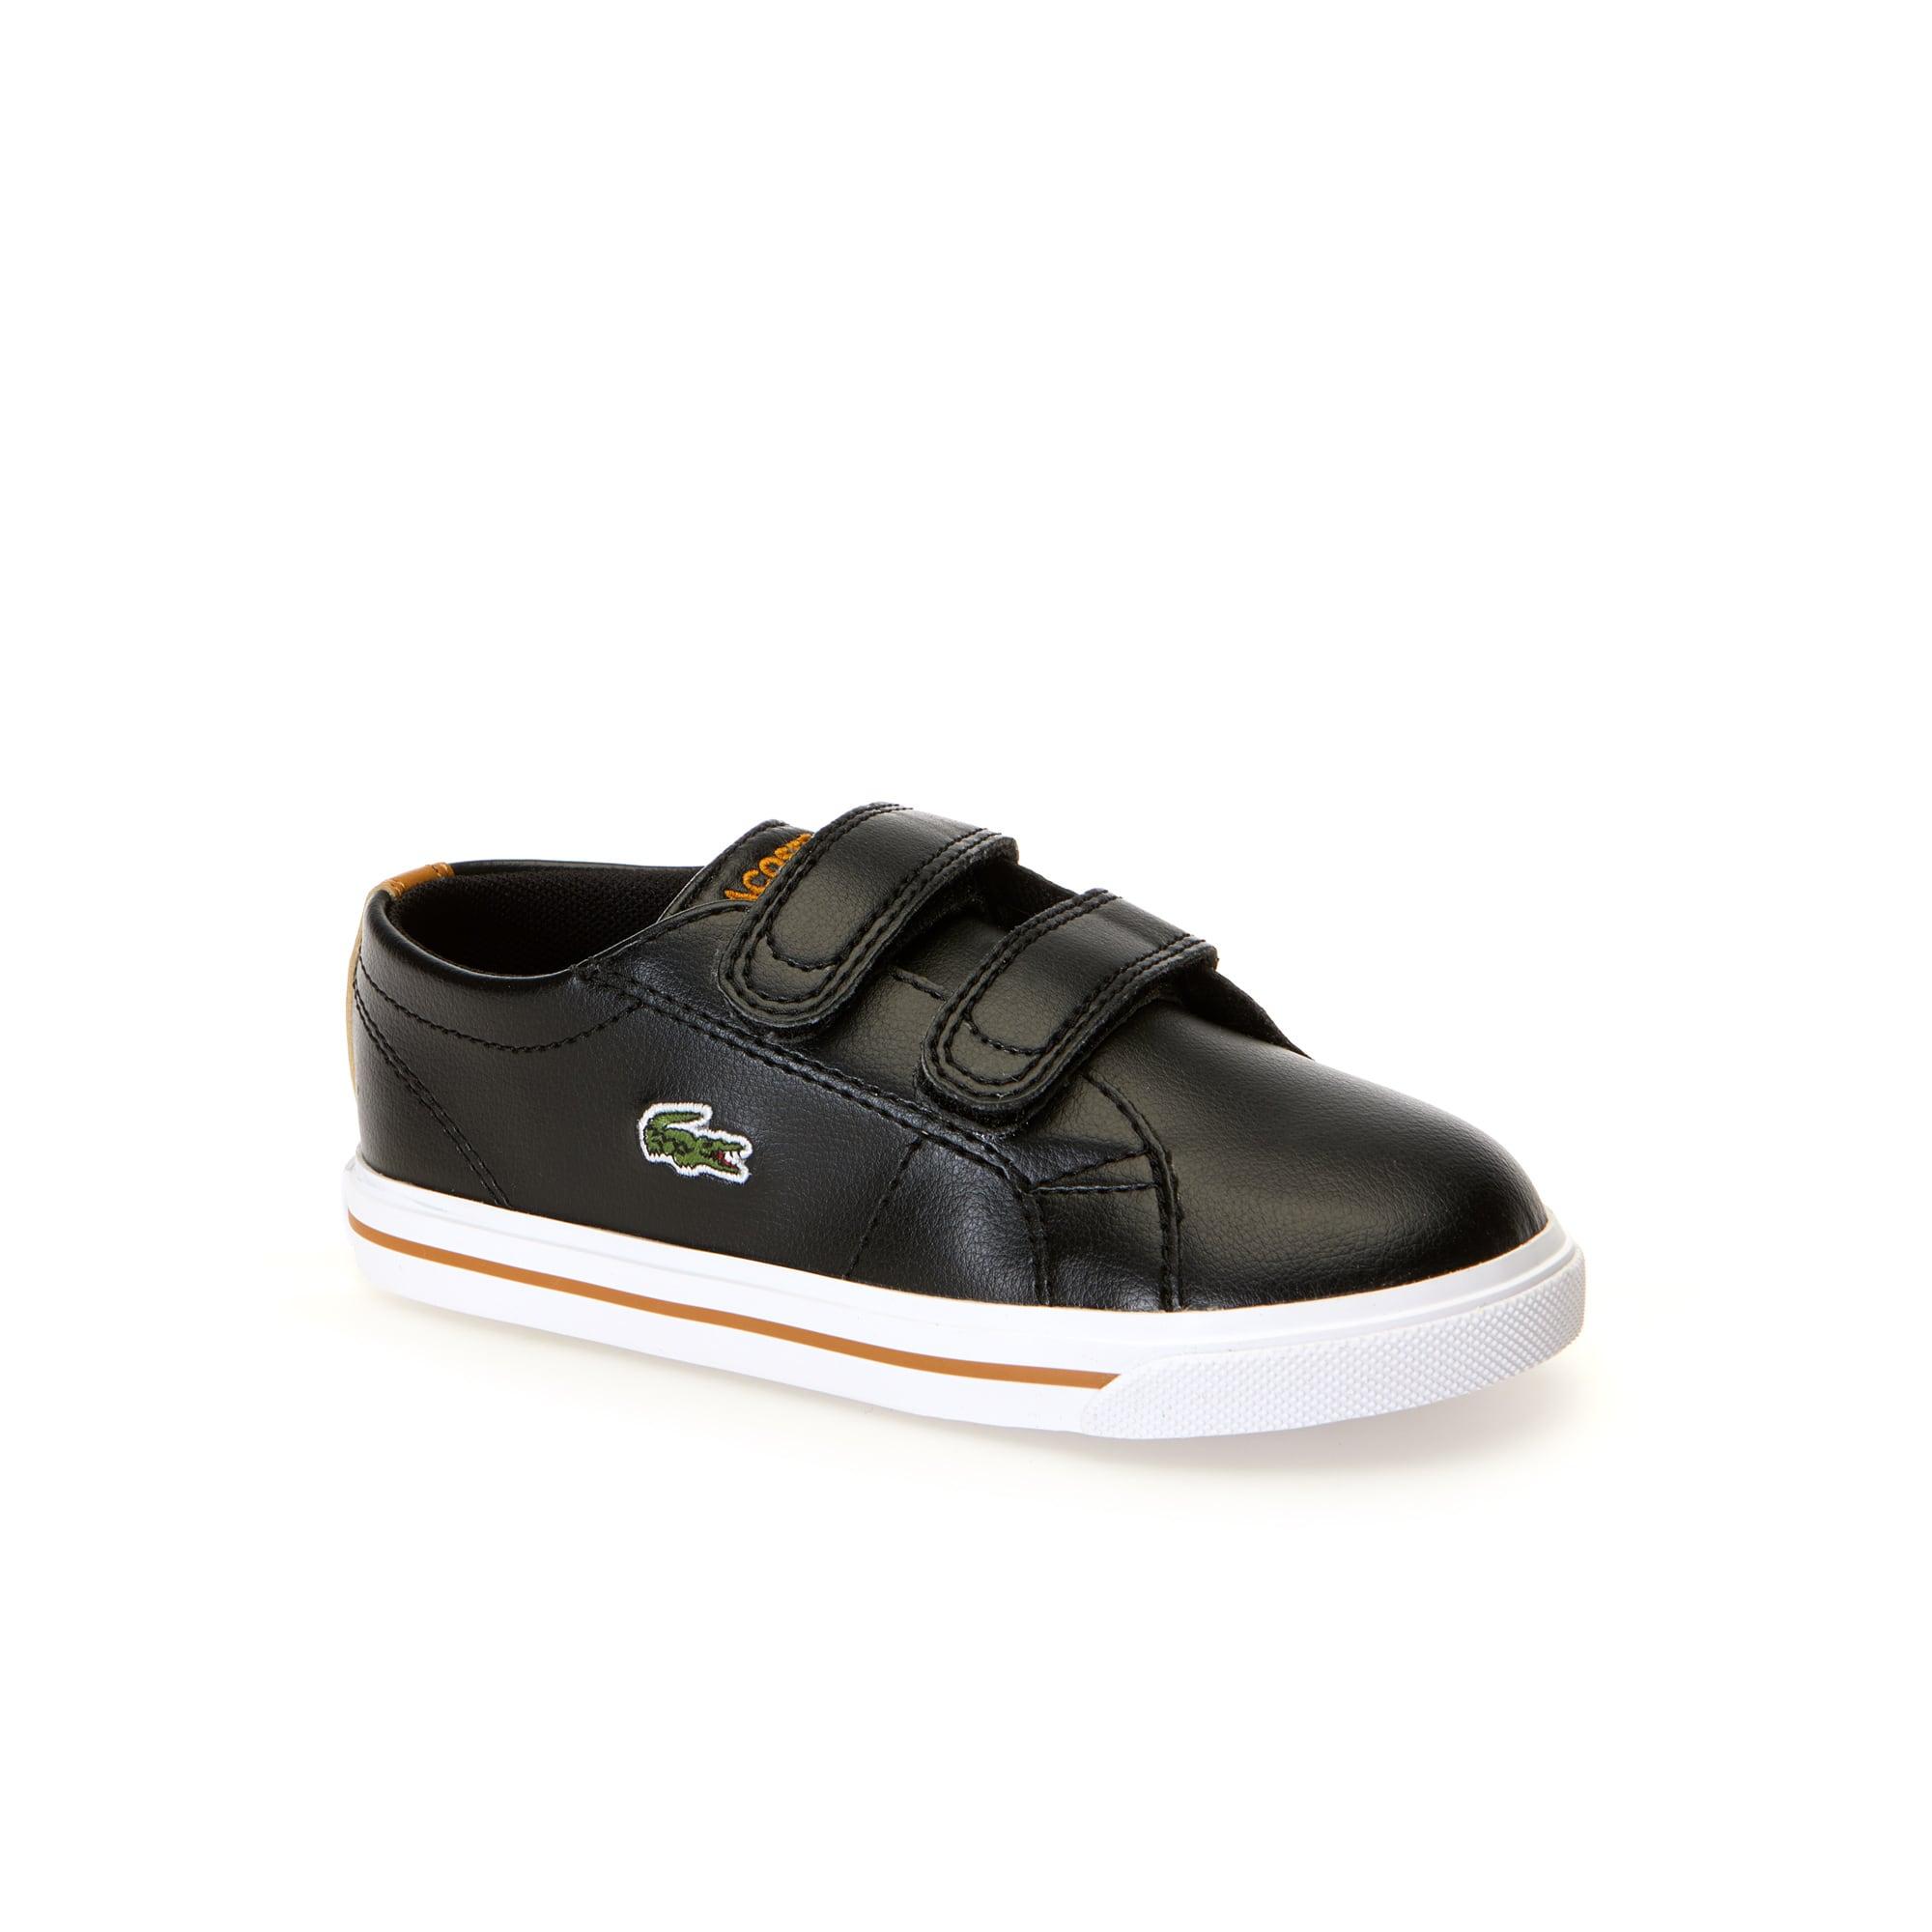 Sneakers Riberac bébés en textile